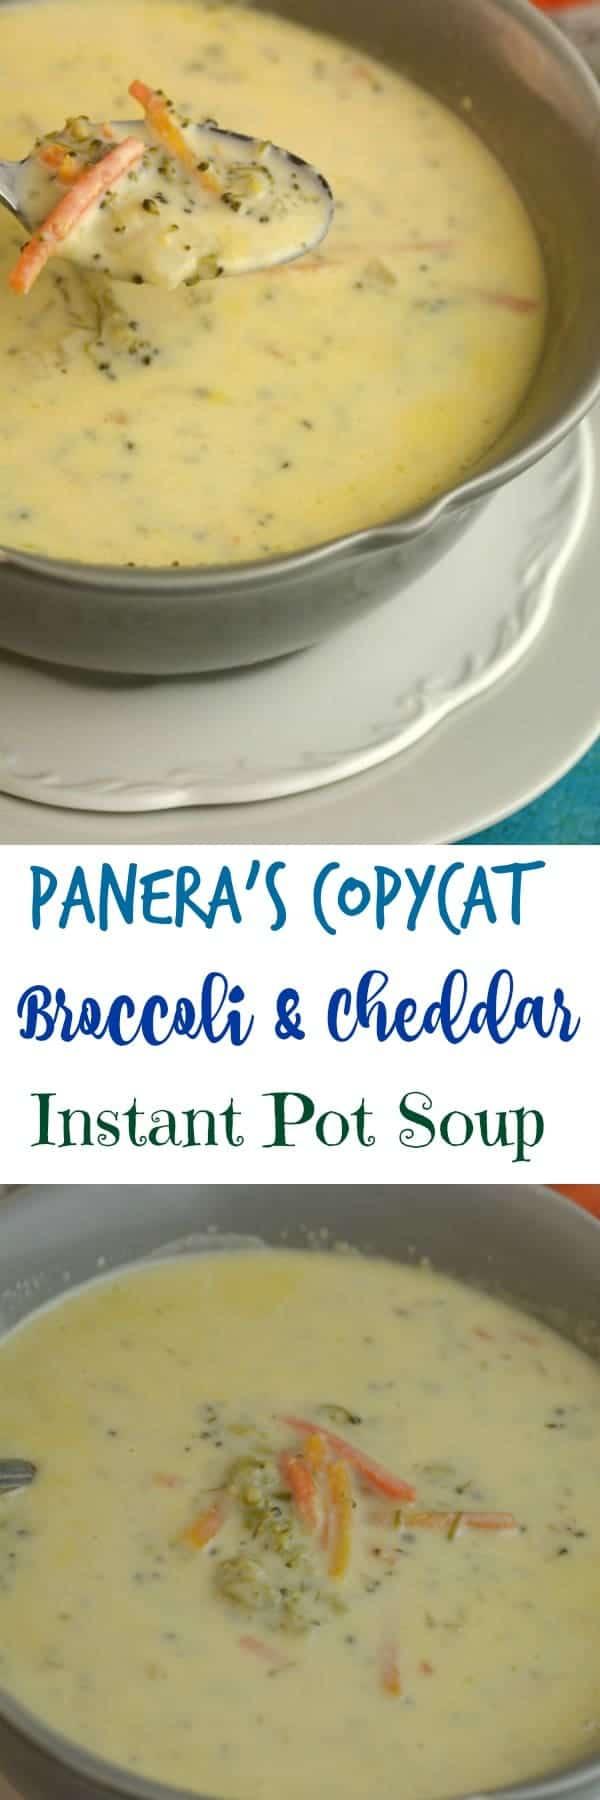 Panera's Copy Cat Broccoli and Cheddar Soup Instant Pot